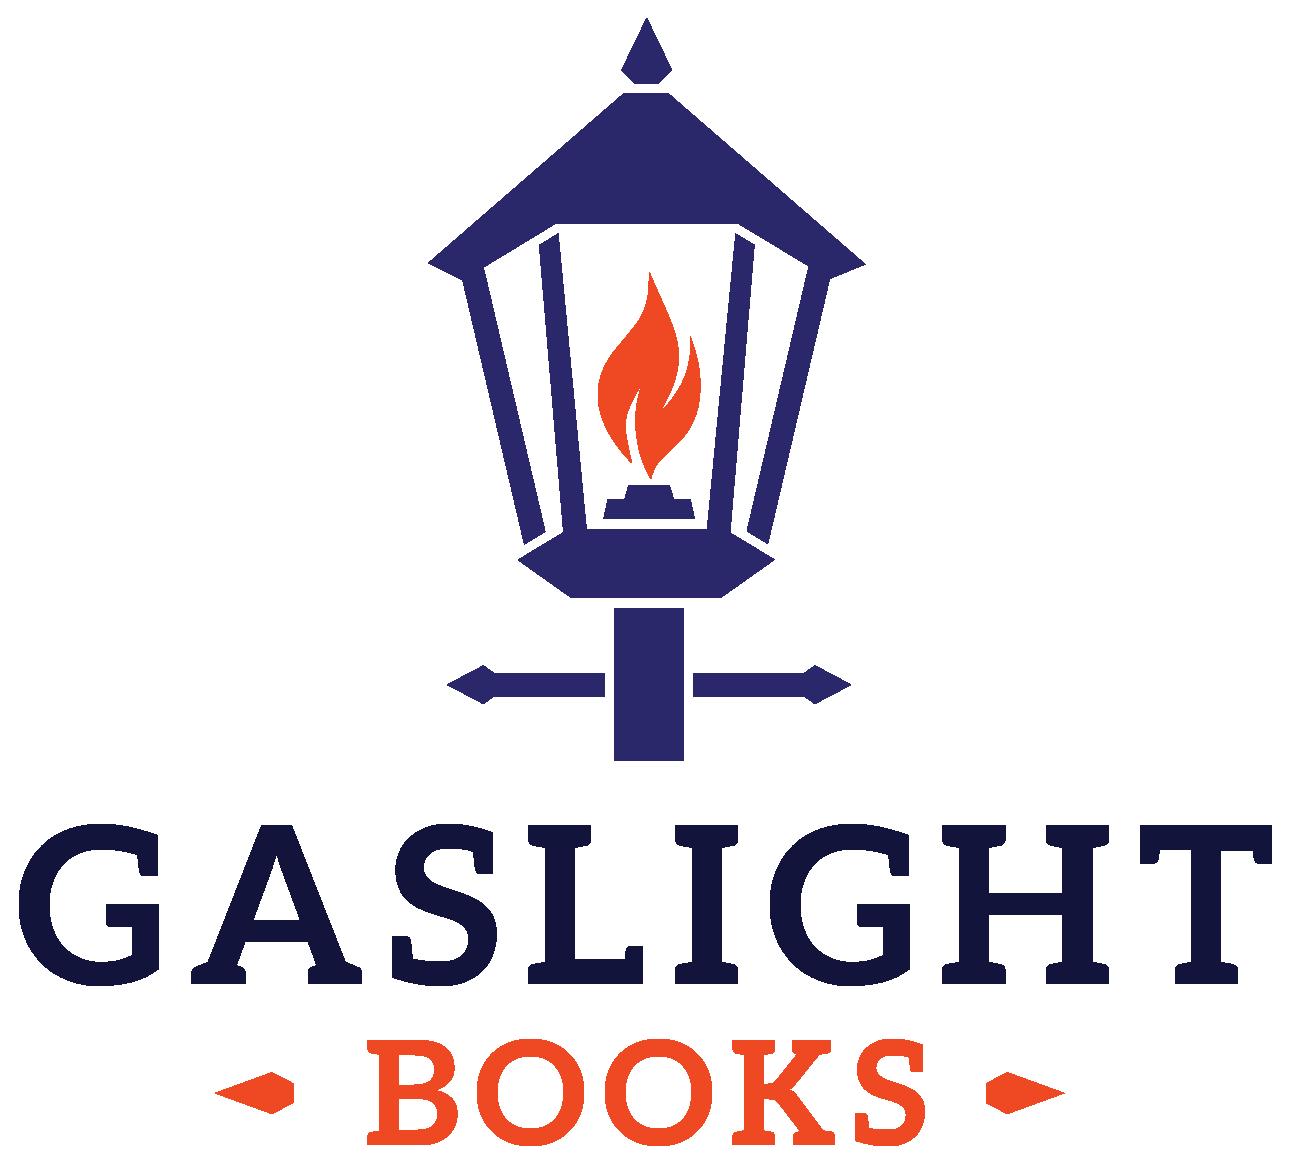 Gaslight Books